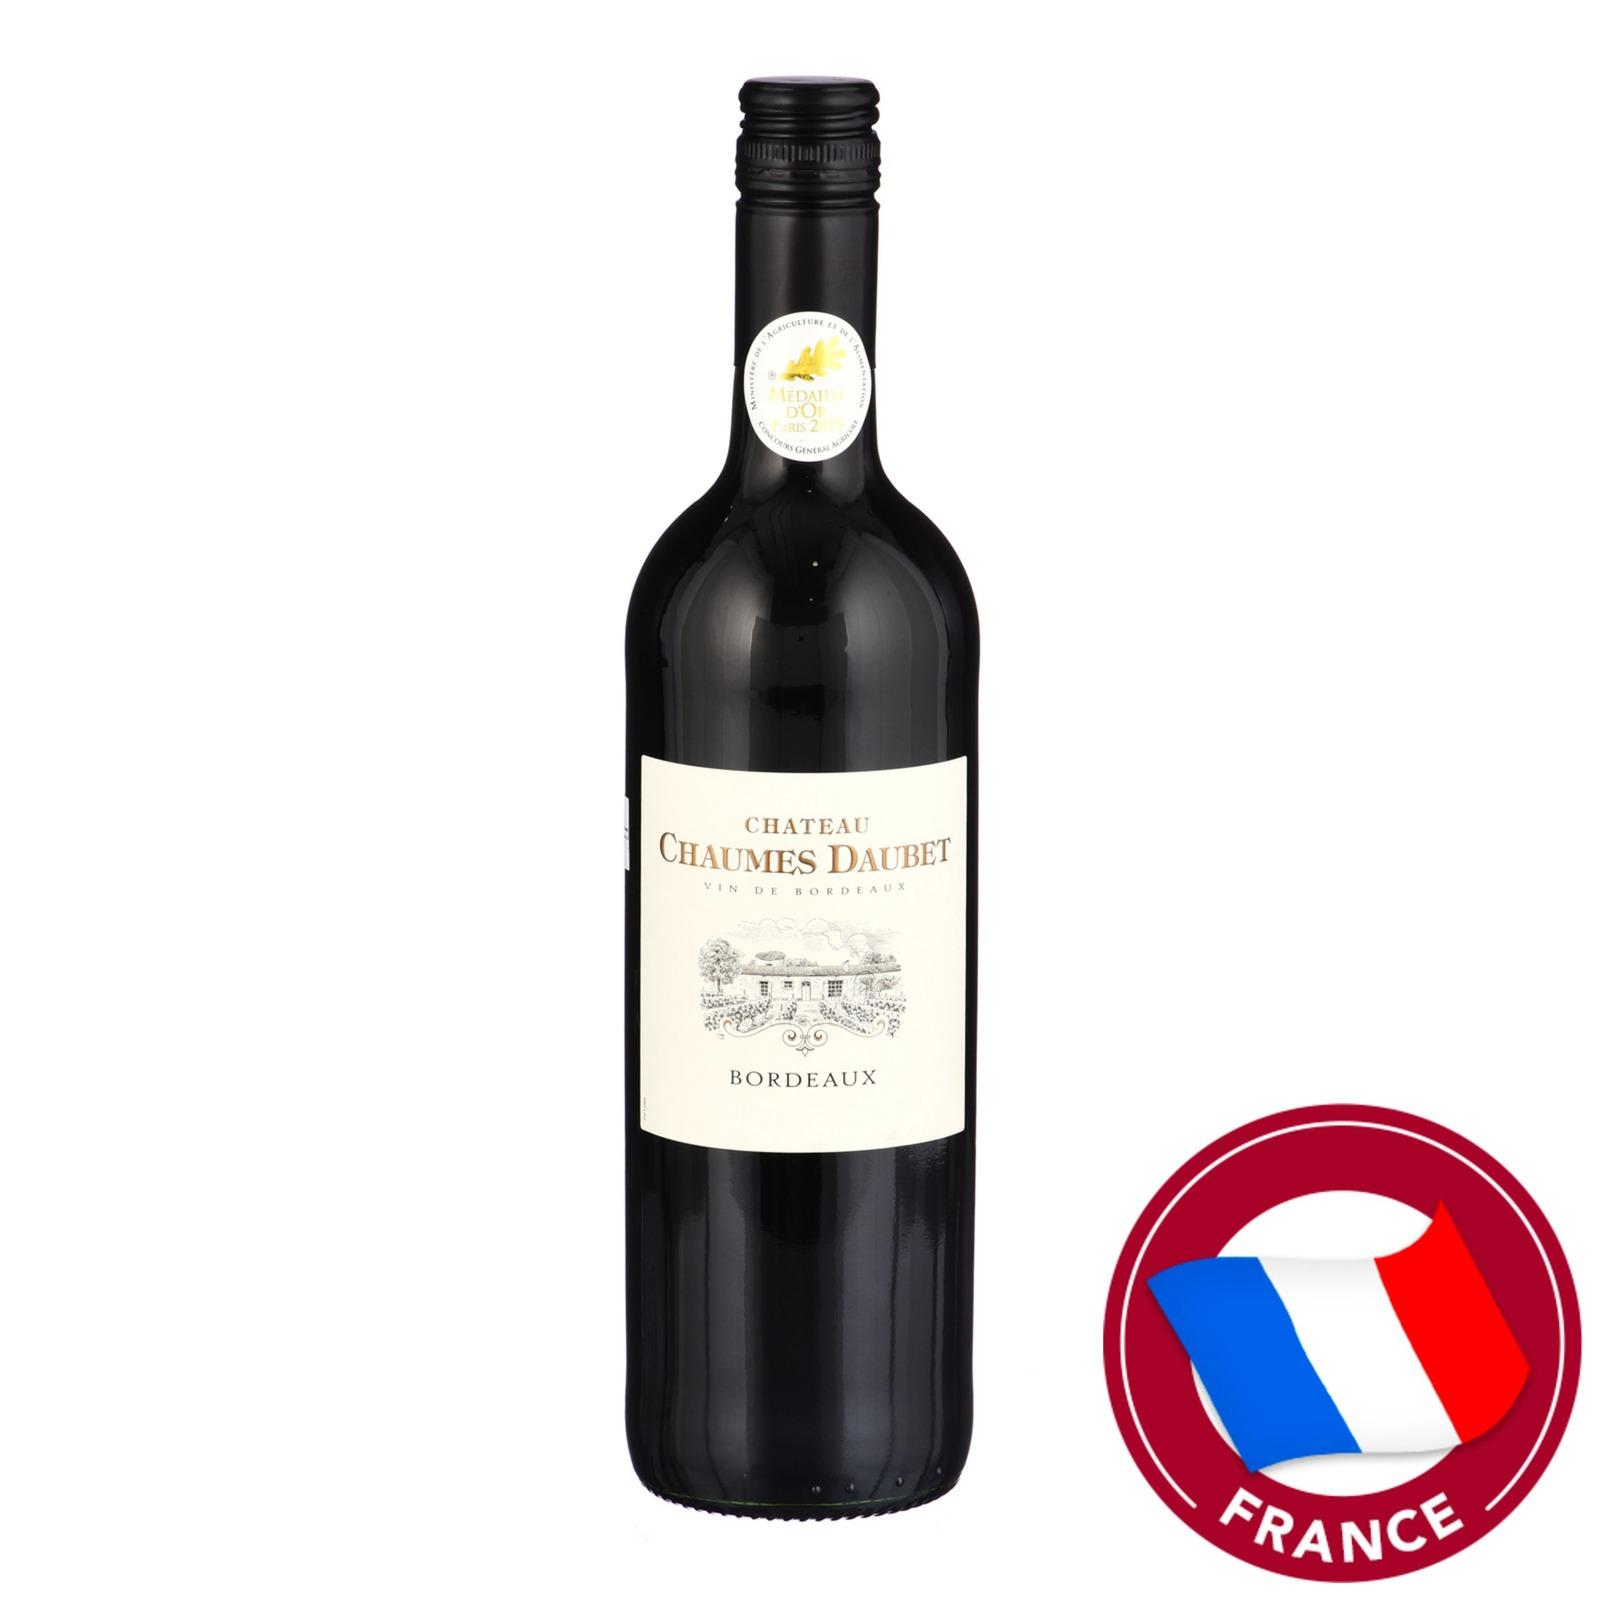 Terre de Vignerones Chateau Chaumes Daubet Red Wine